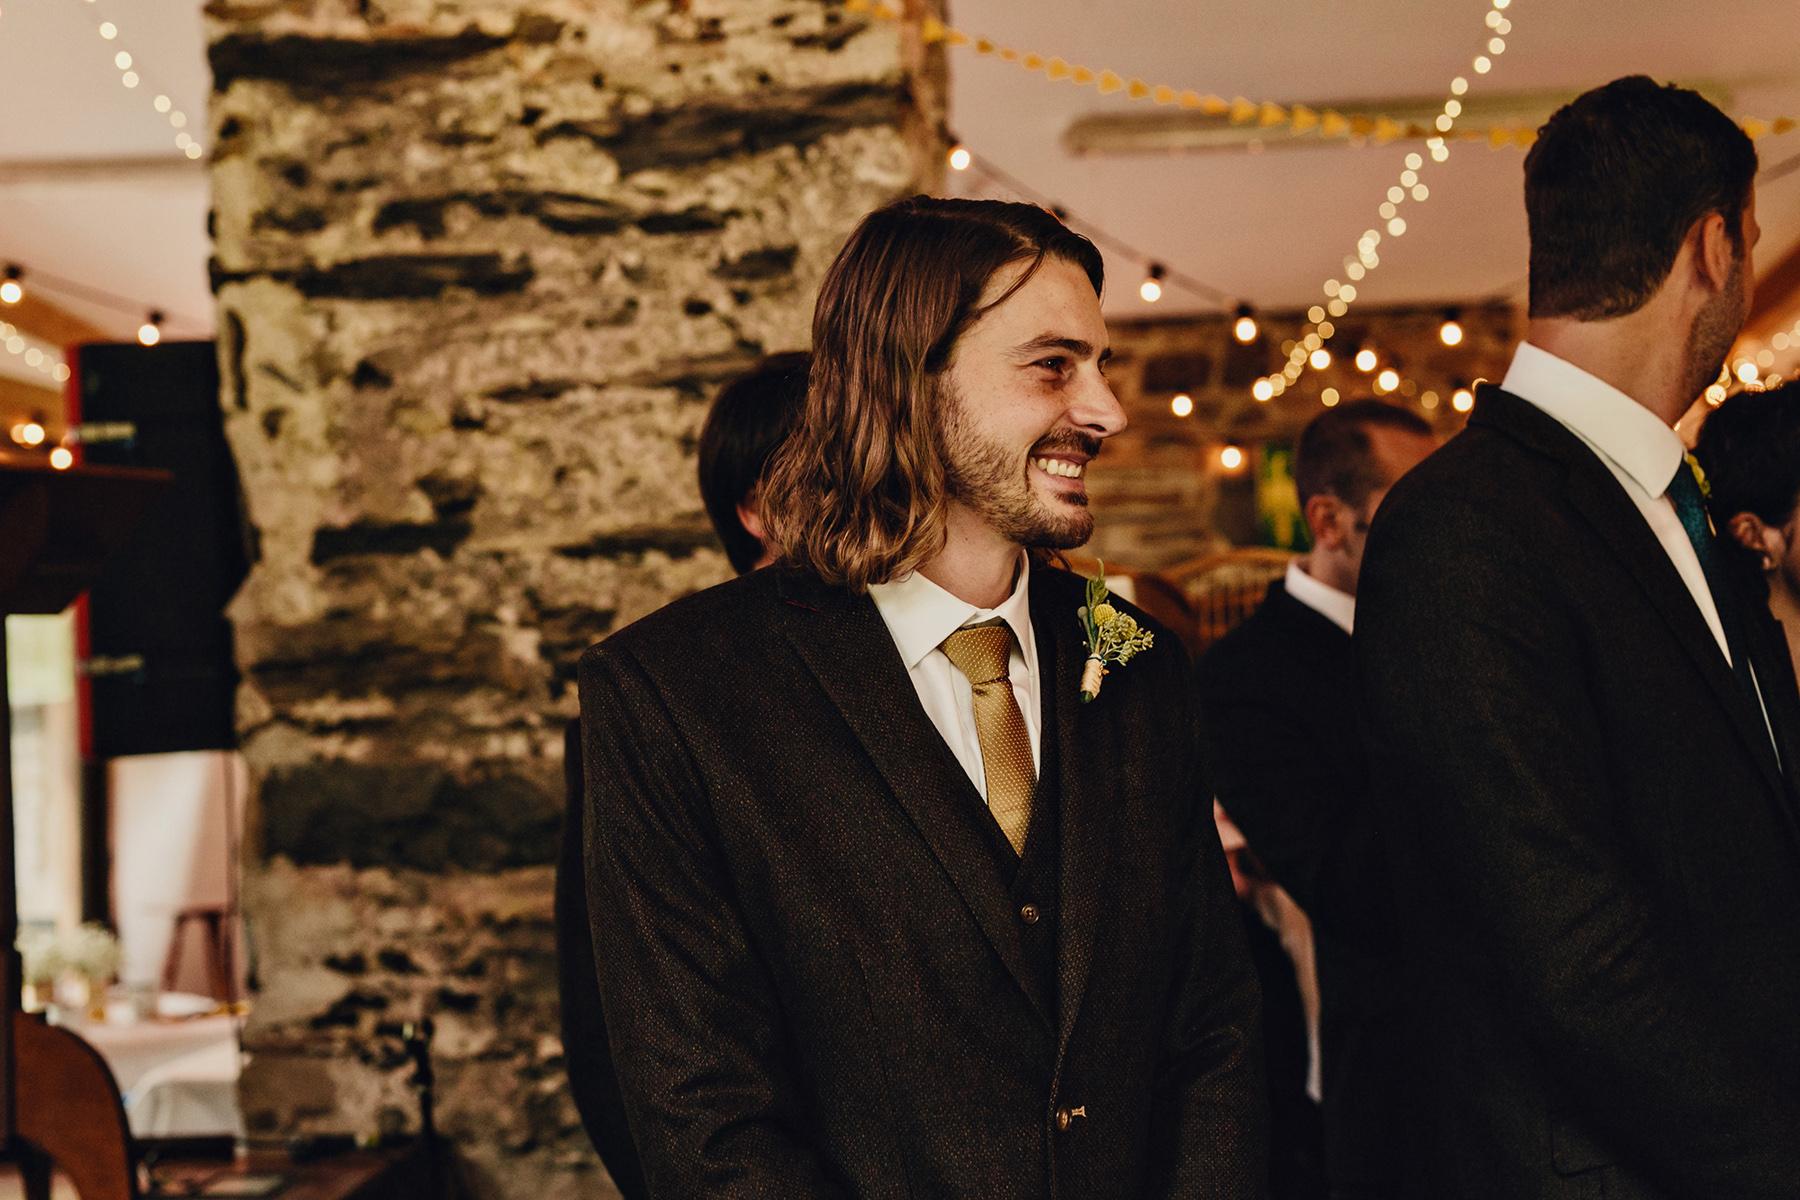 Snowdonia-Wales-Wedding-Photos-0316.jpg